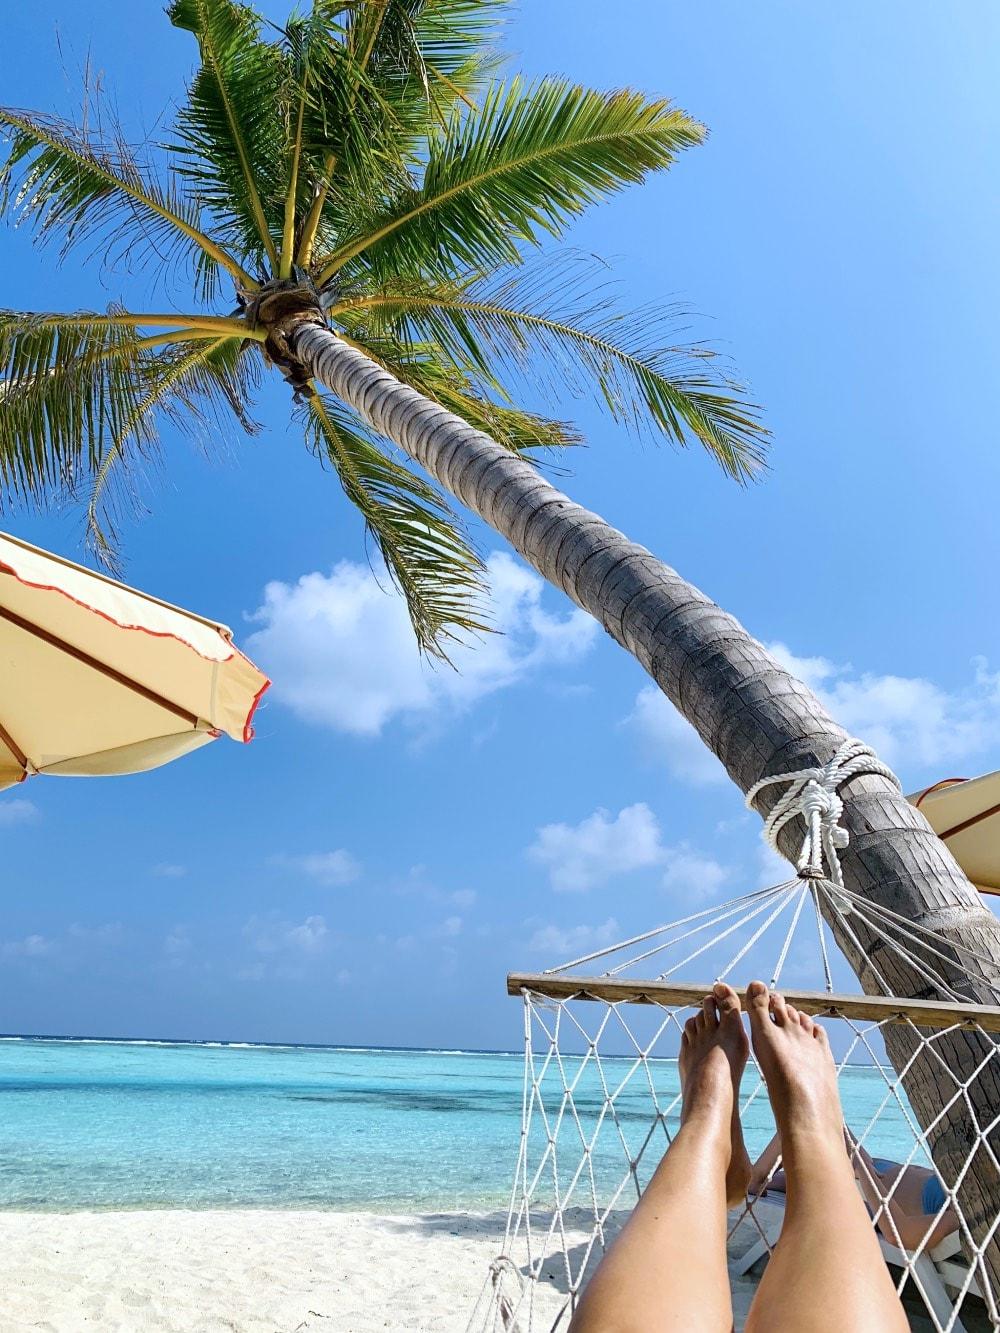 Dhiffushi maldives hammock beach sea paradise